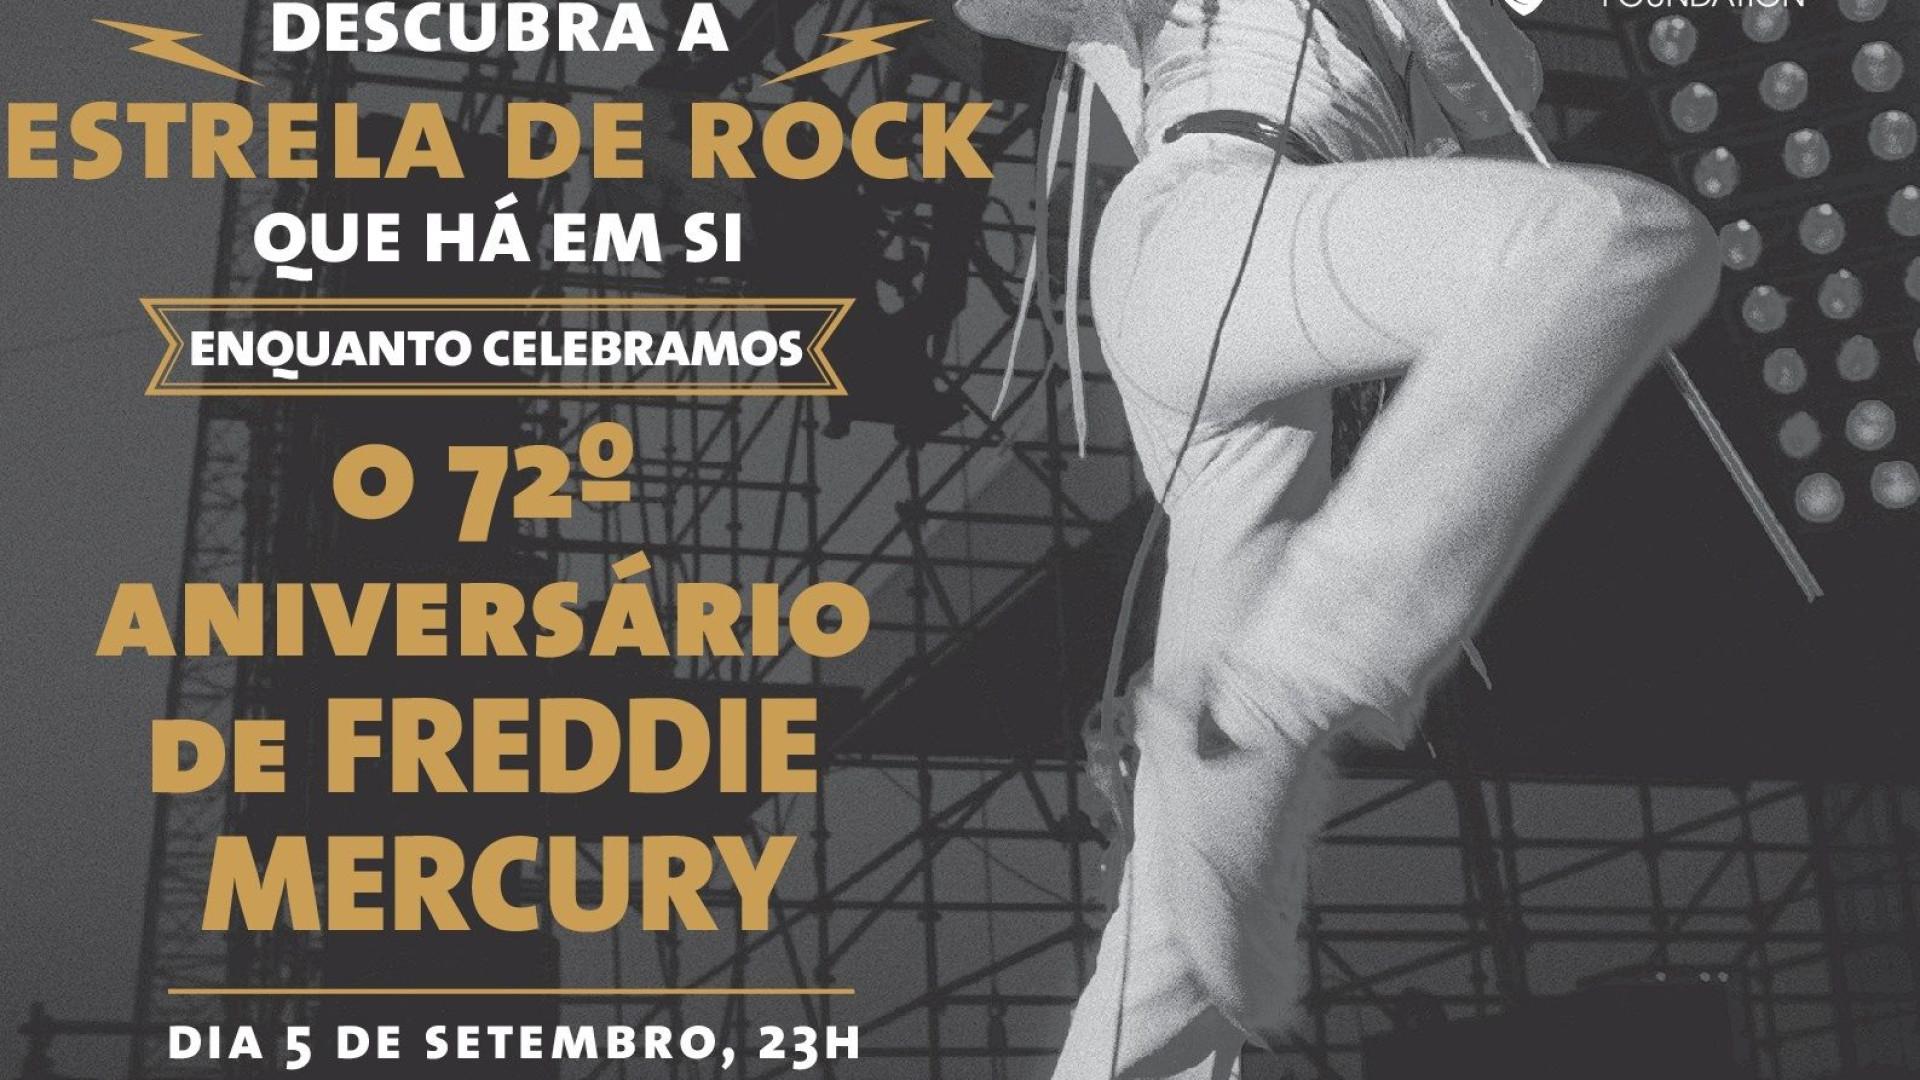 Hard Rock Caf 233 Lisboa Honra Freddie Mercury Com Dia